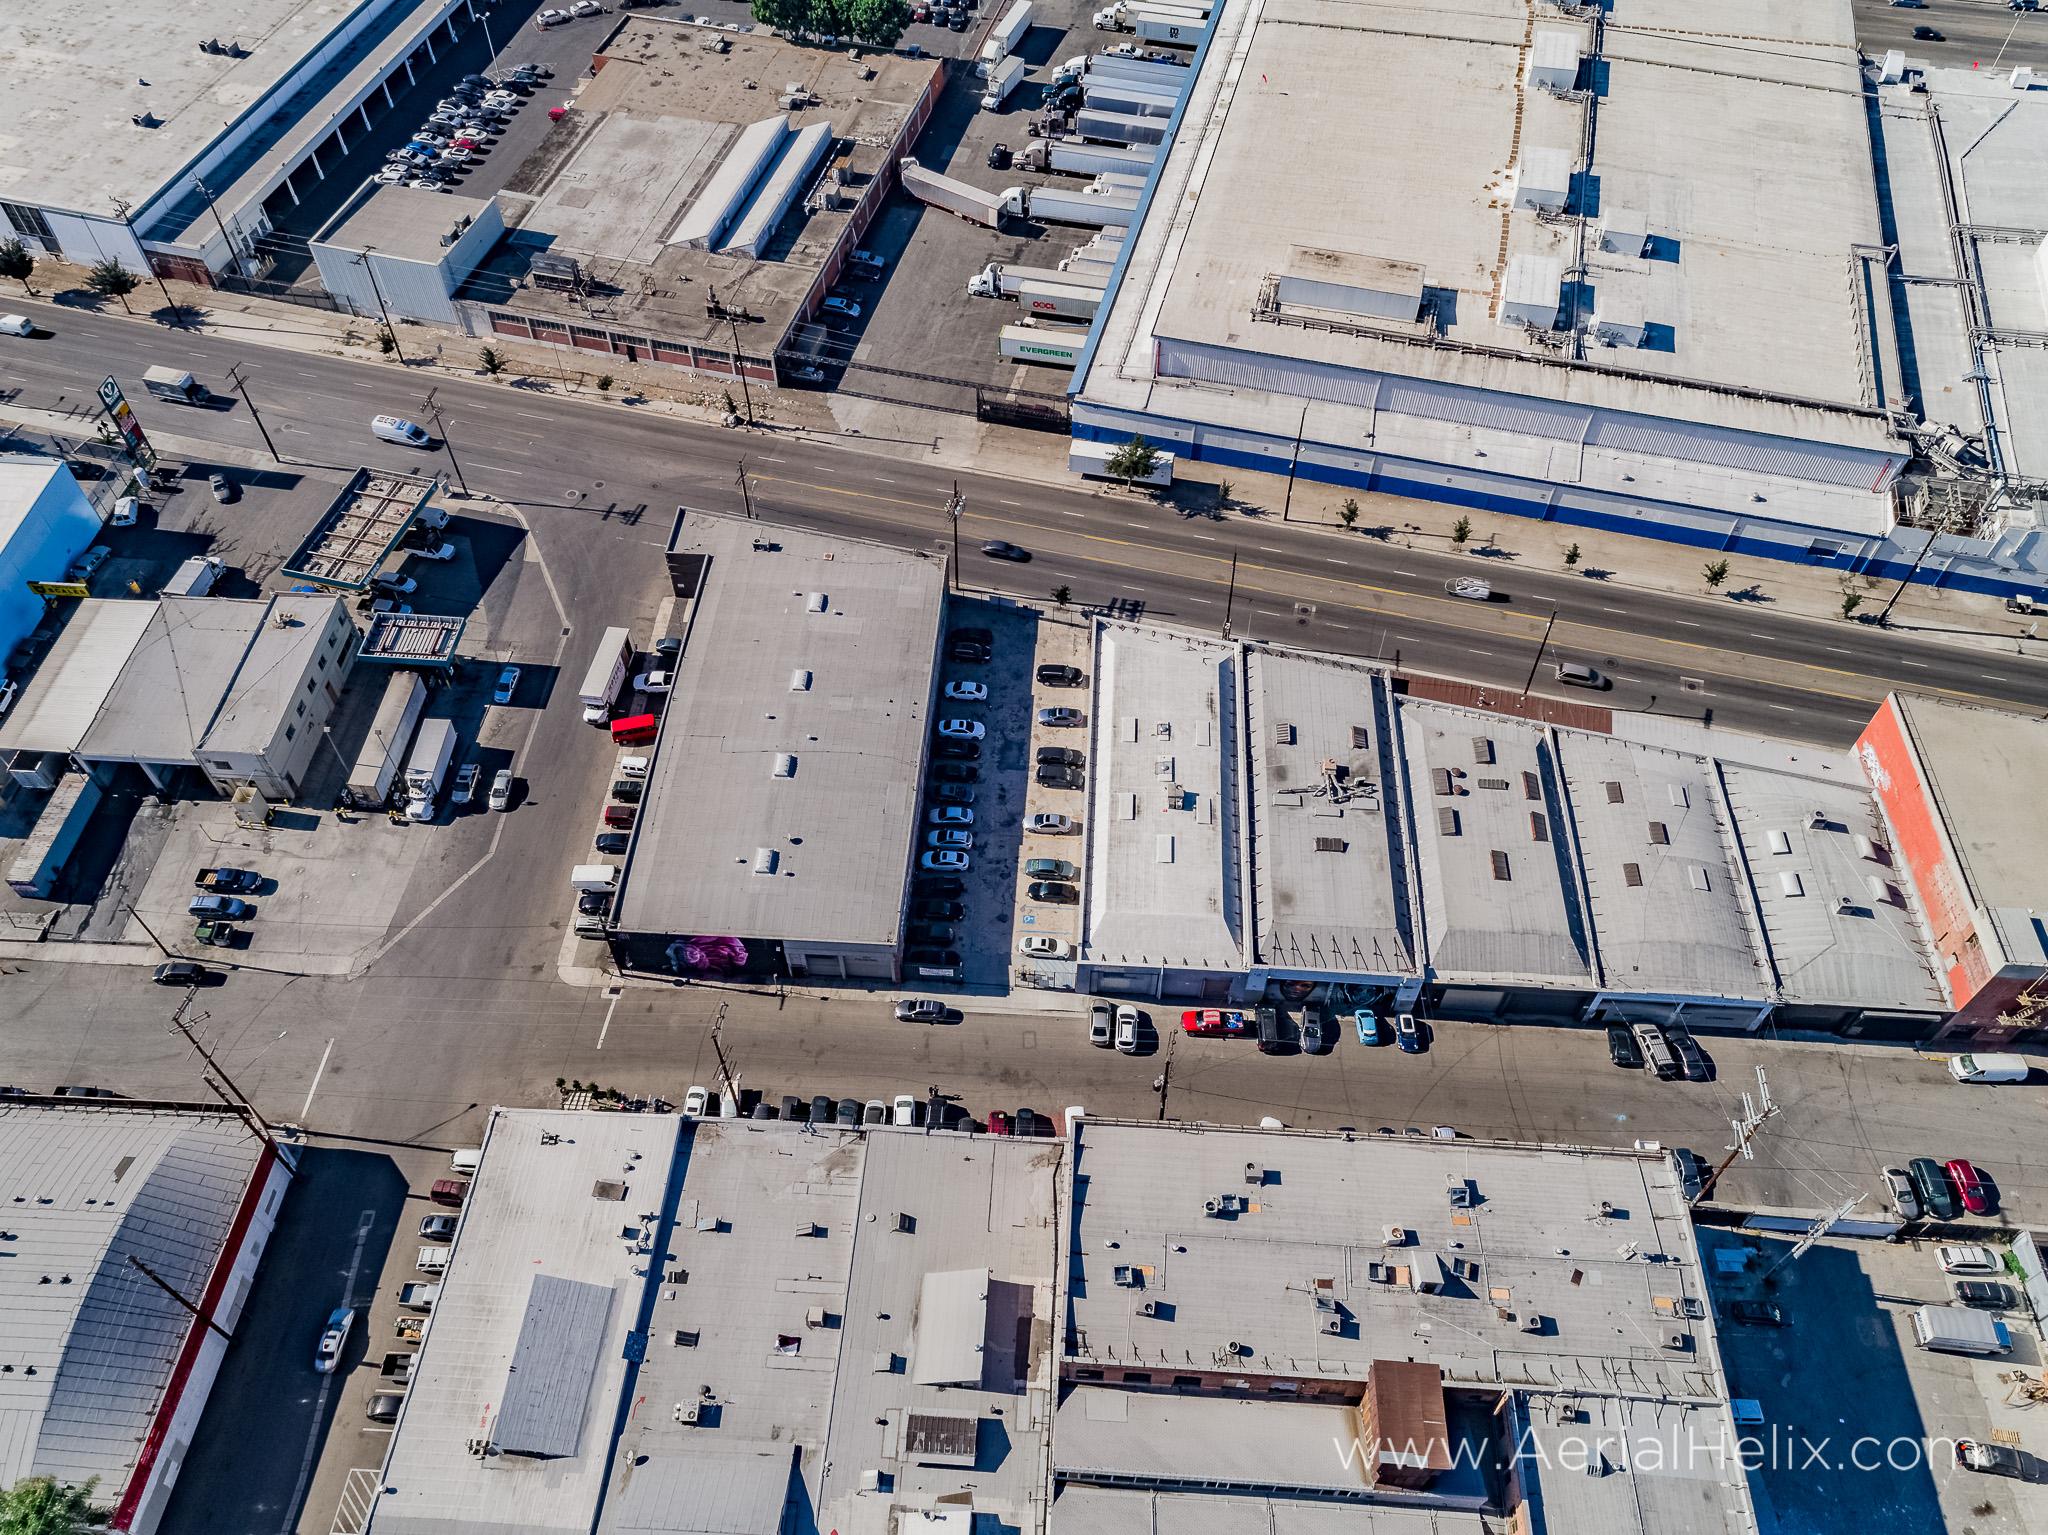 Perfect Parking 2 aerial photographer-15.jpg